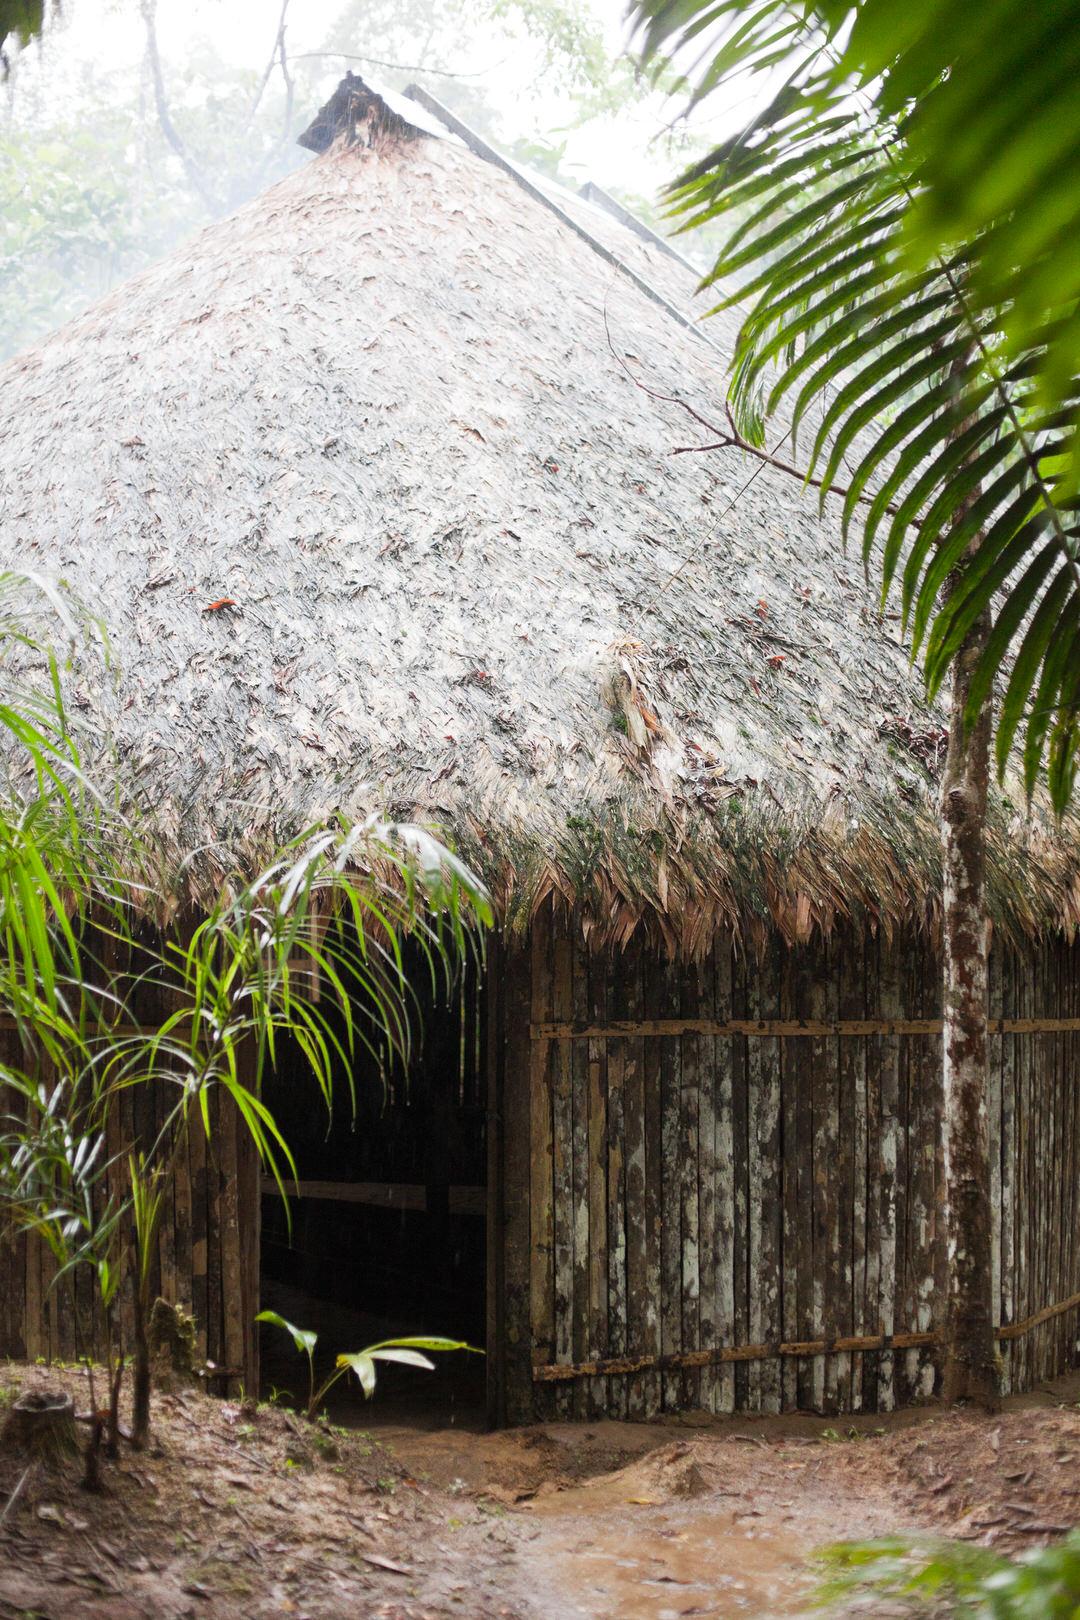 melissa kruse photography - chinimp tuna station, amazon, ecuador-15.jpg